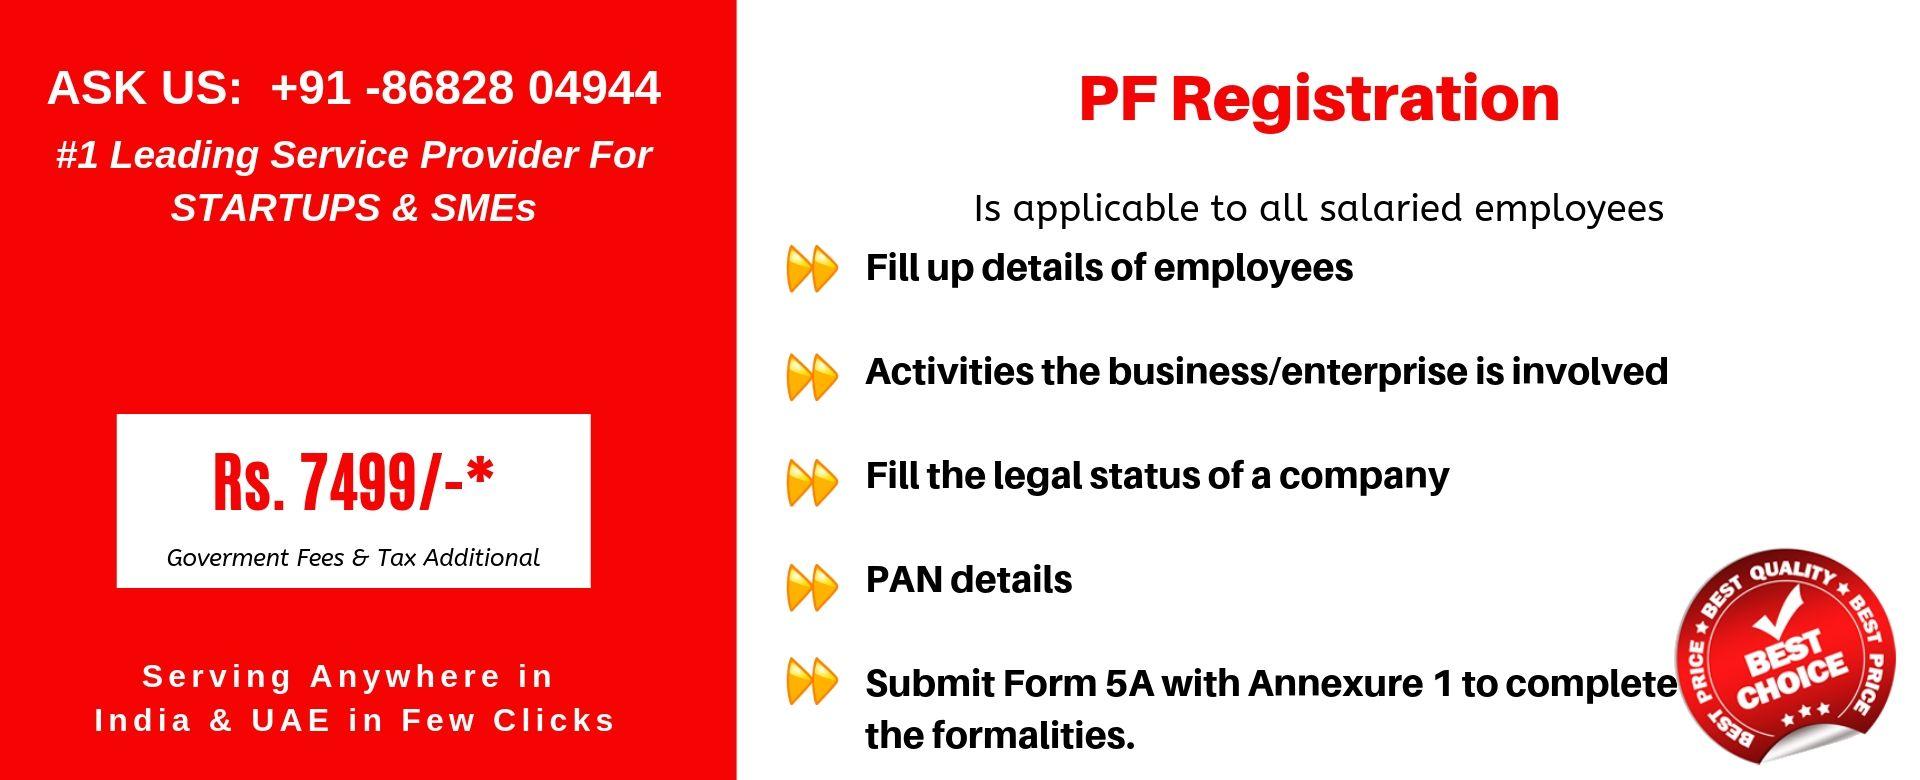 pf registration in india